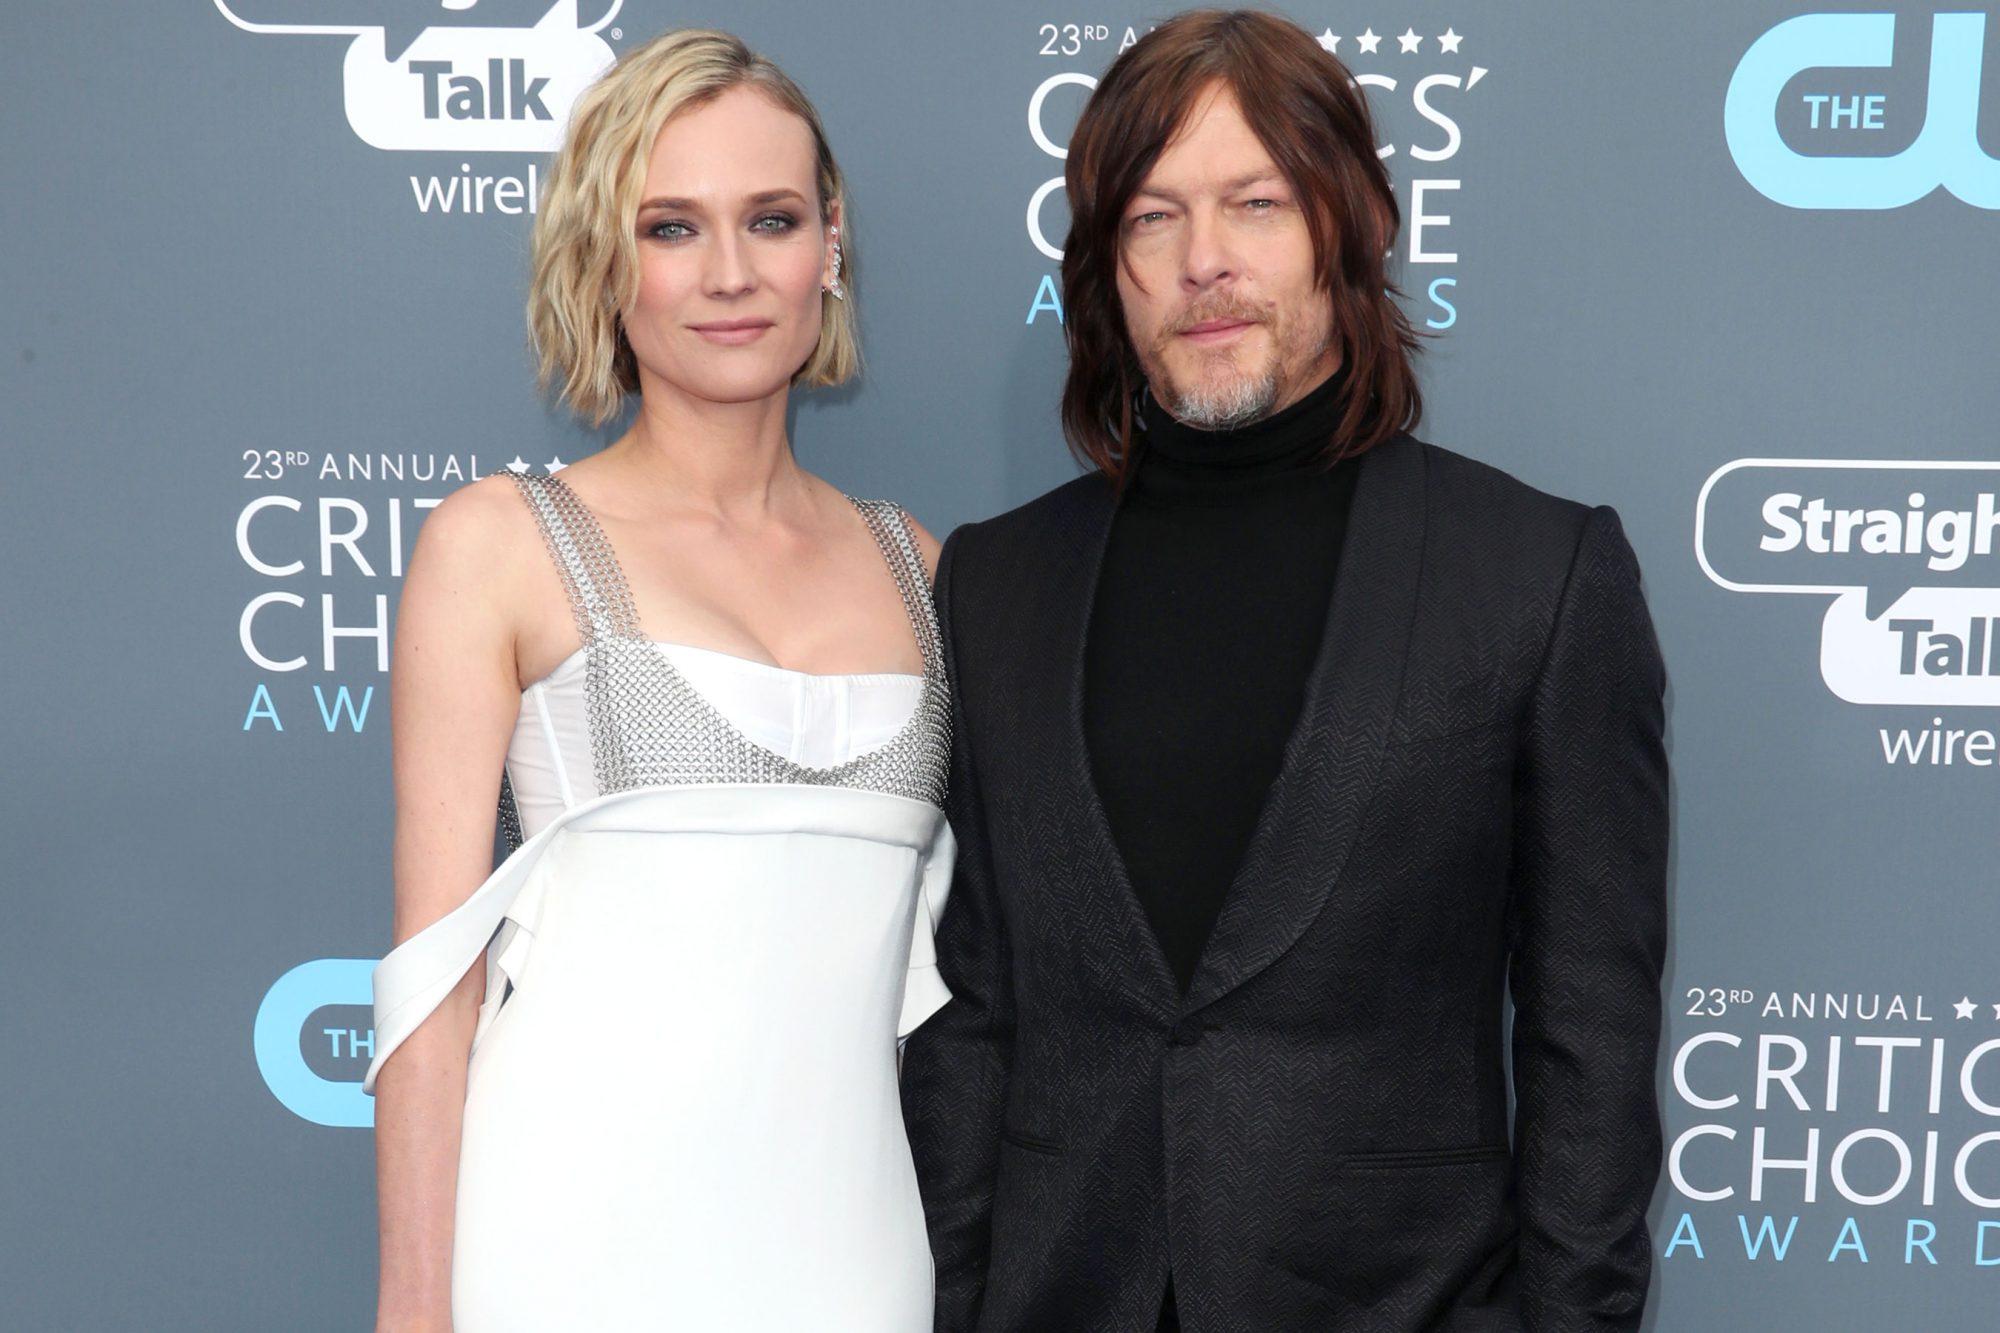 Critics' Choice Awards, Arrivals, Los Angeles, USA - 11 Jan 2018